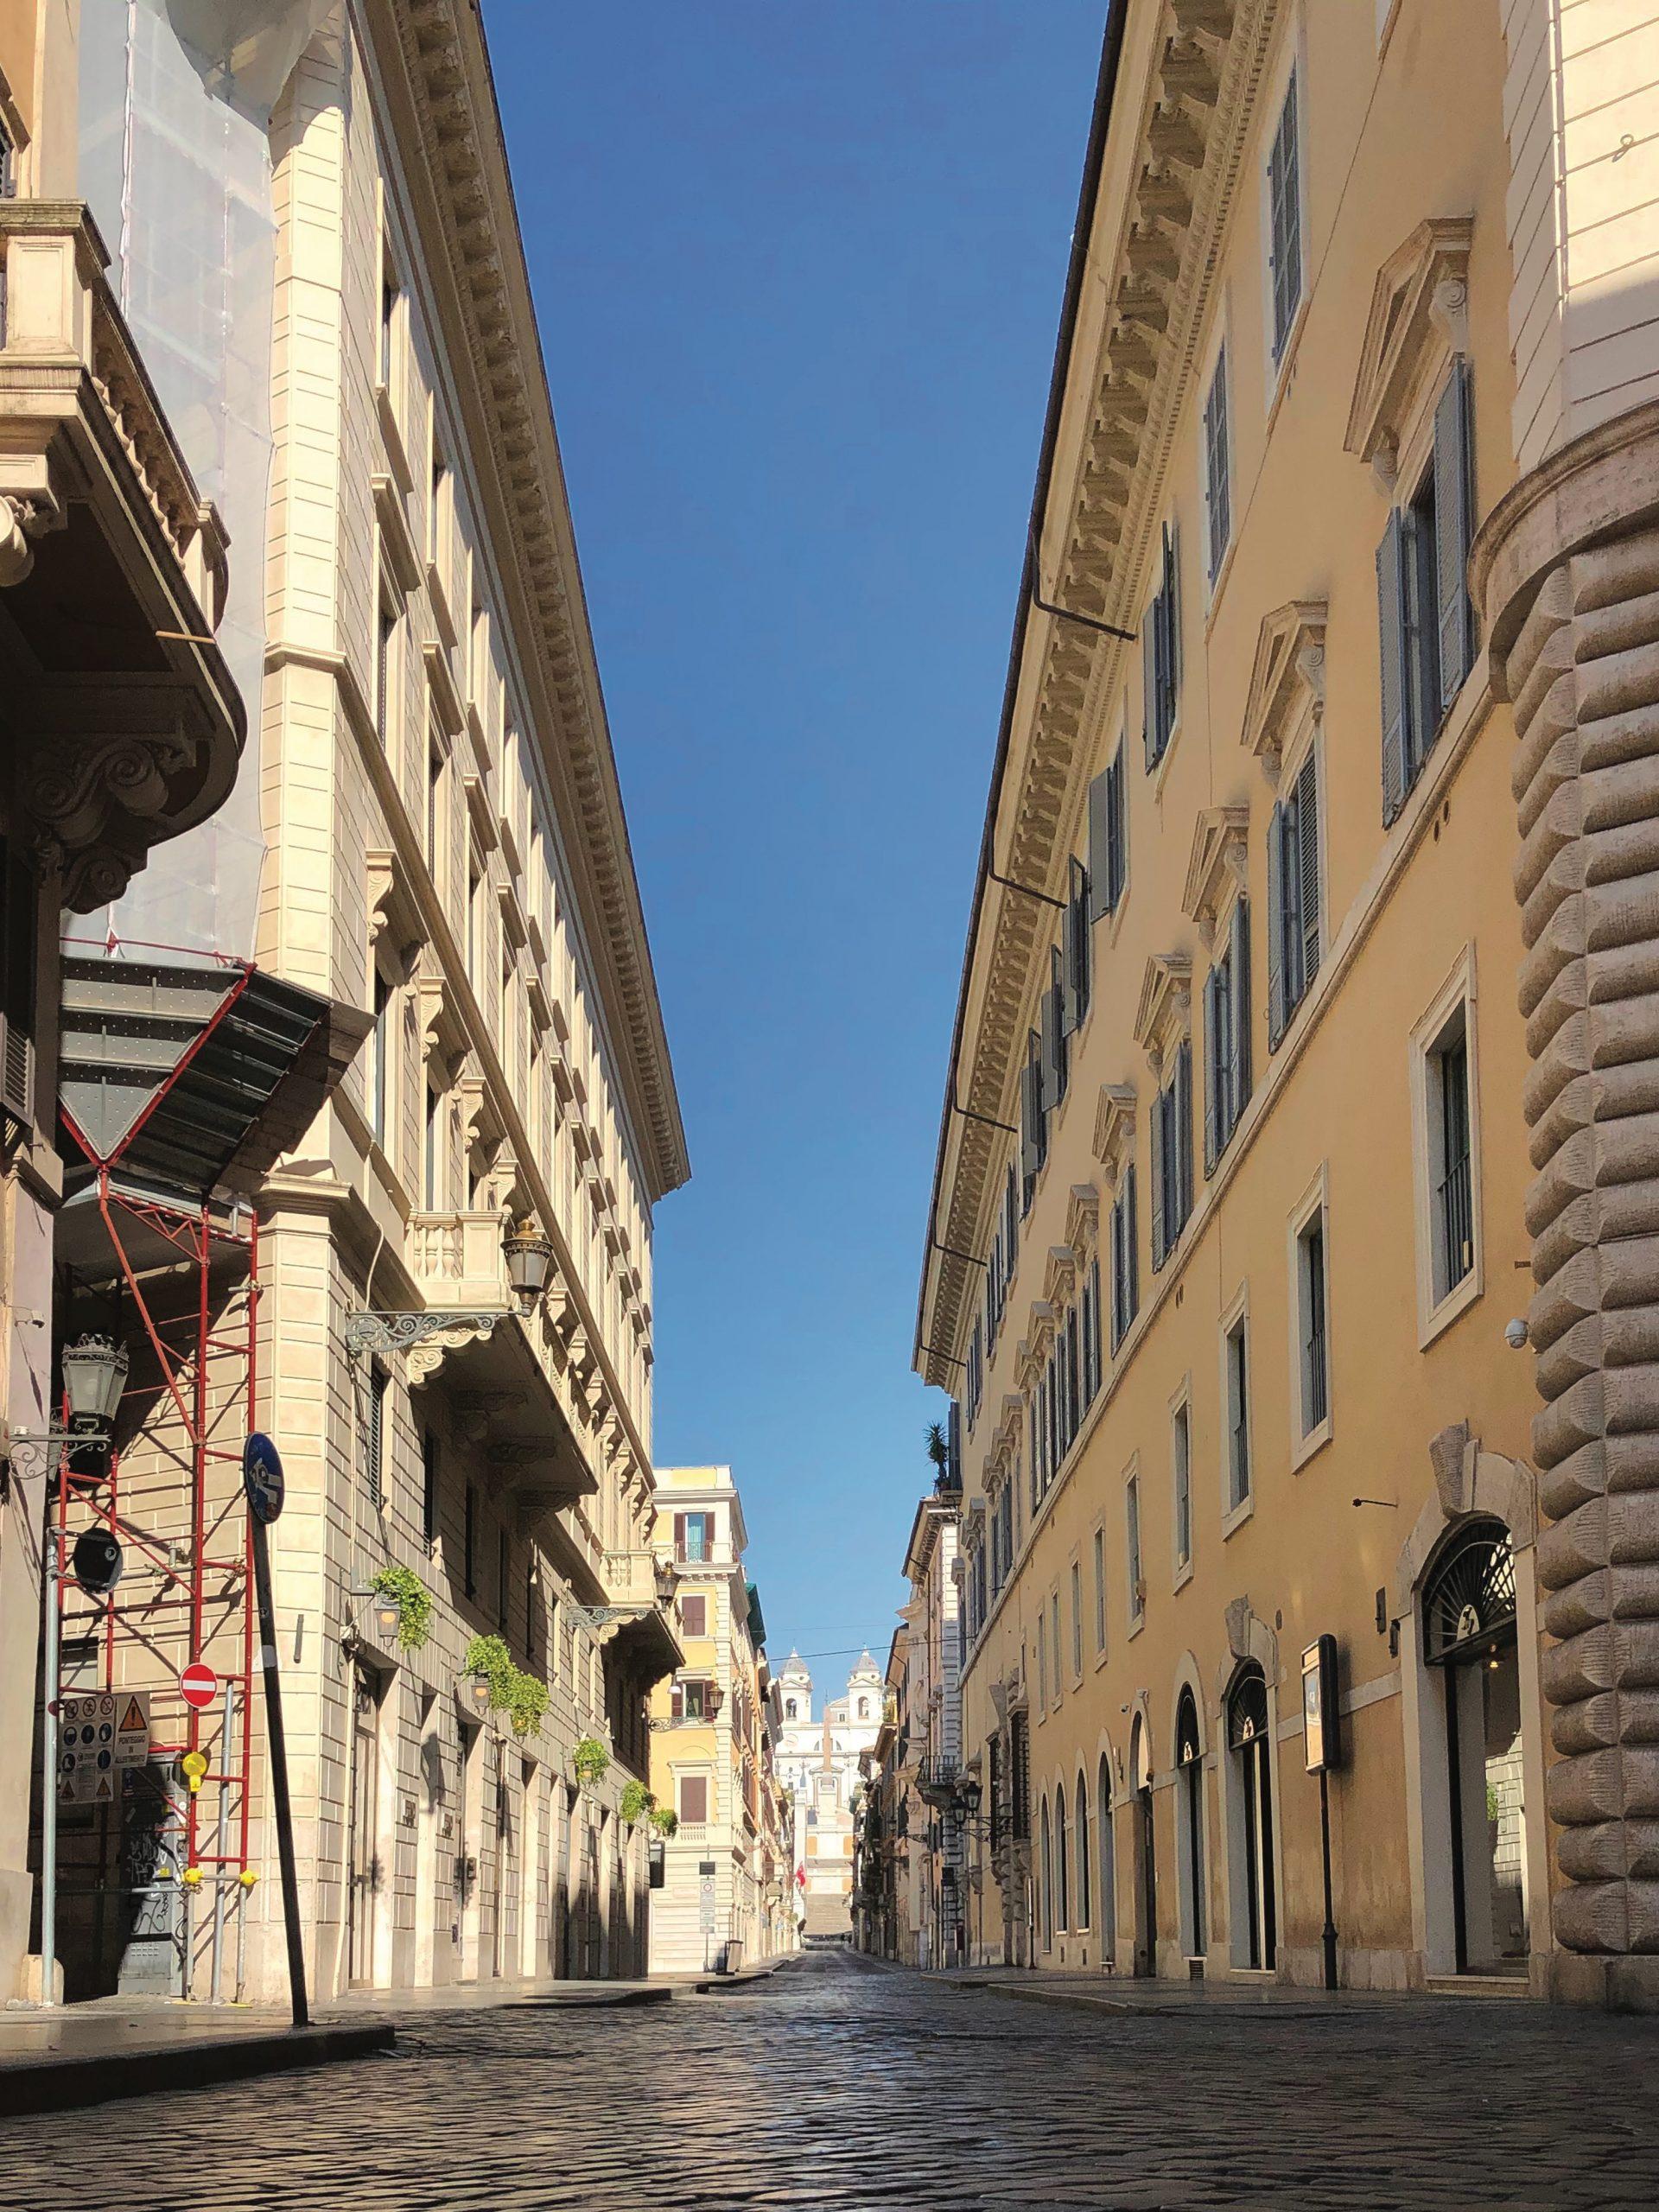 Via Fontanella Borghese